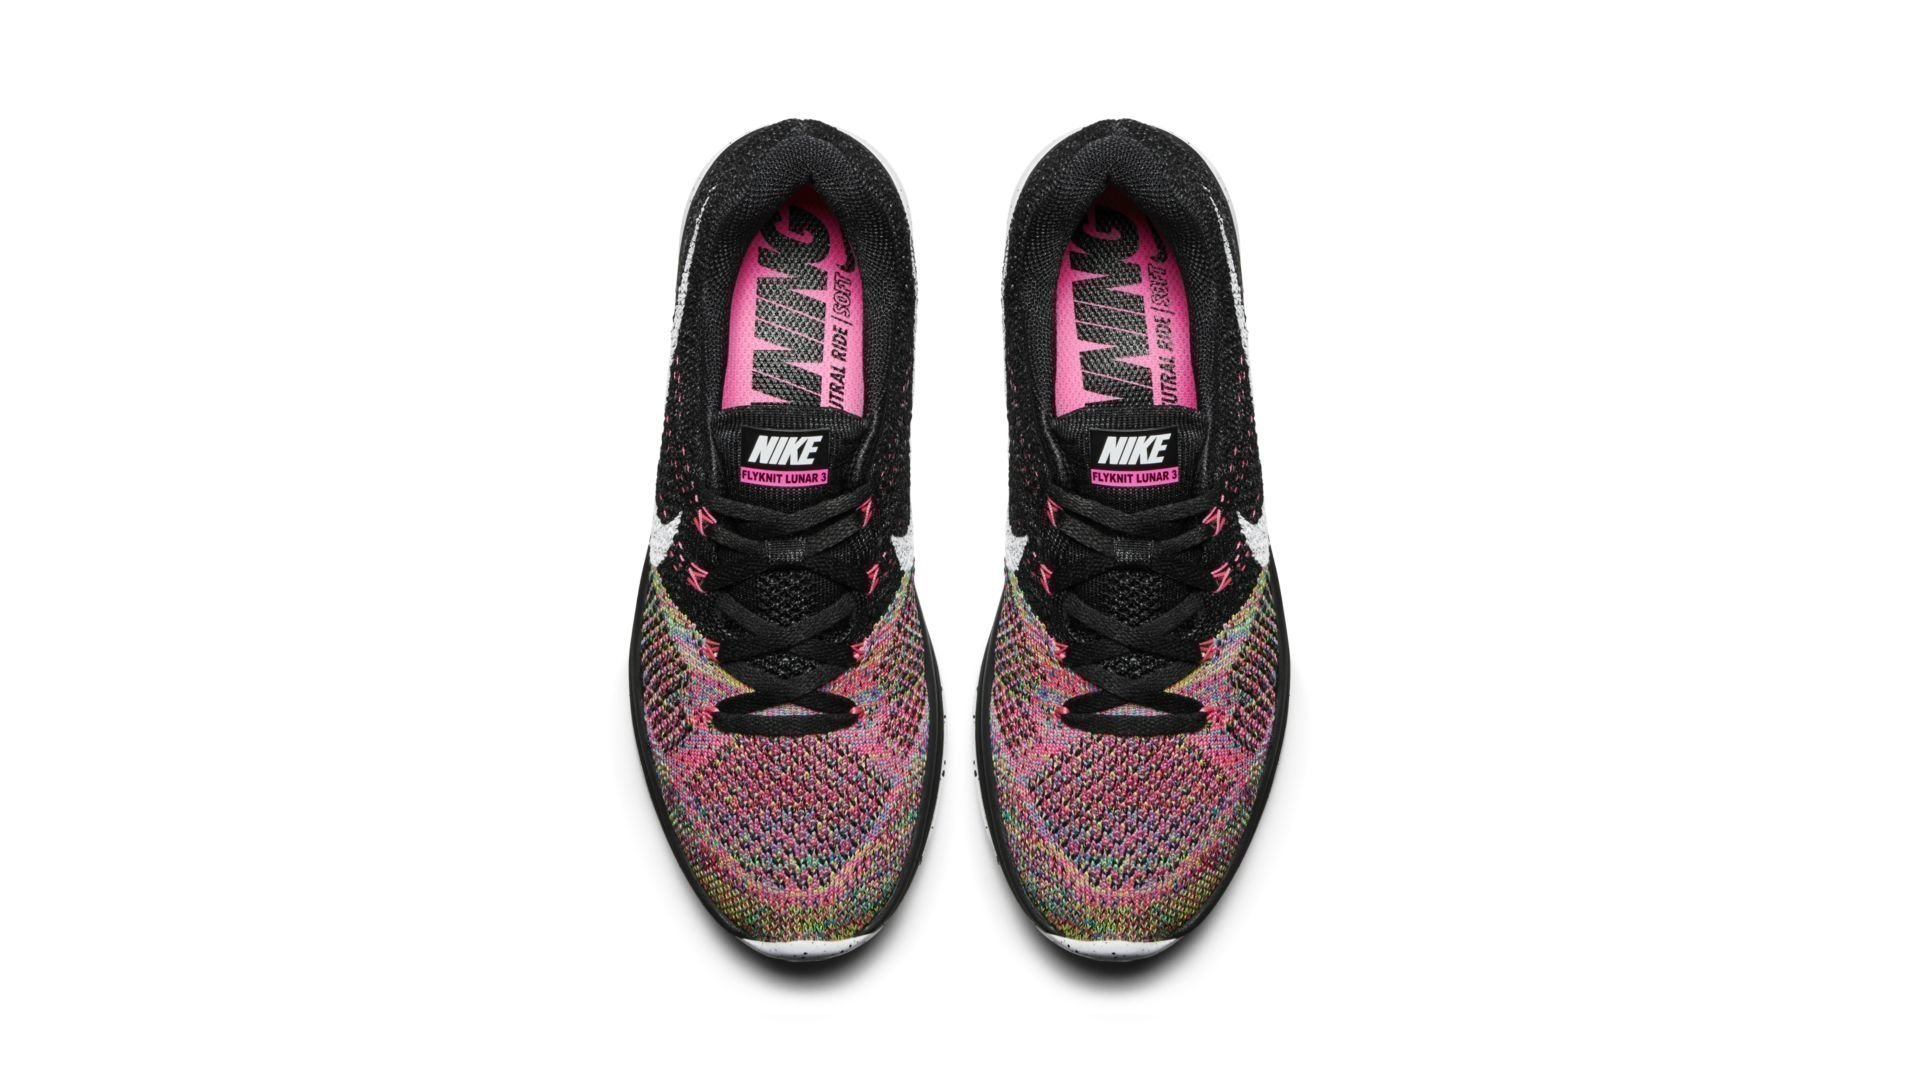 Nike Flyknit Lunar 3 Limited Edition (GS) (698182-003)